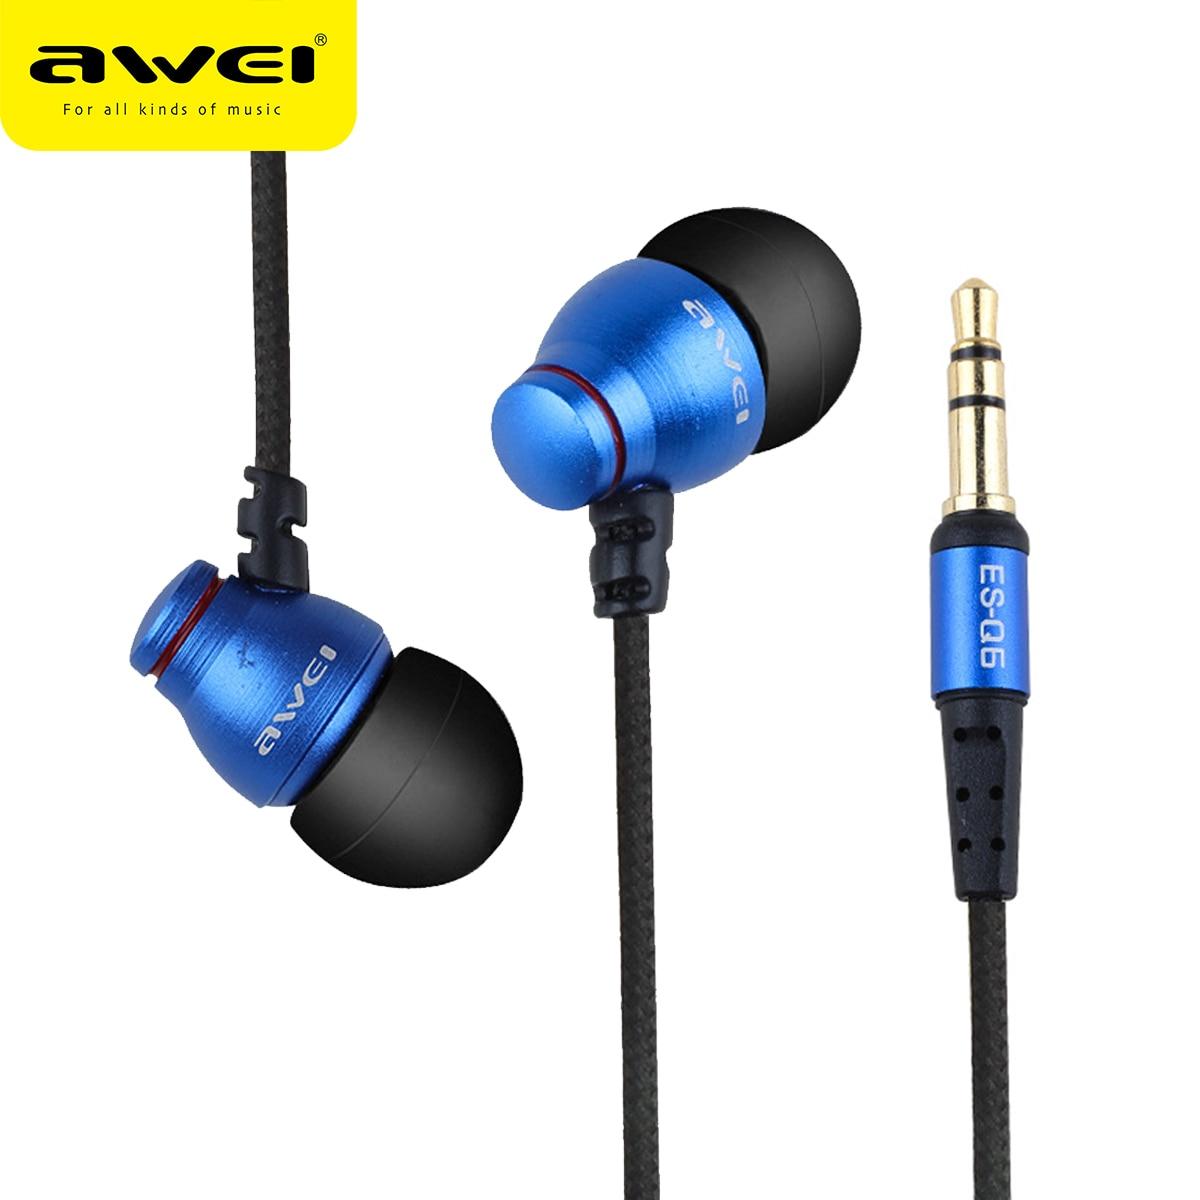 AWEI Q6 Wired Headphone Stereo In-Ear Ea